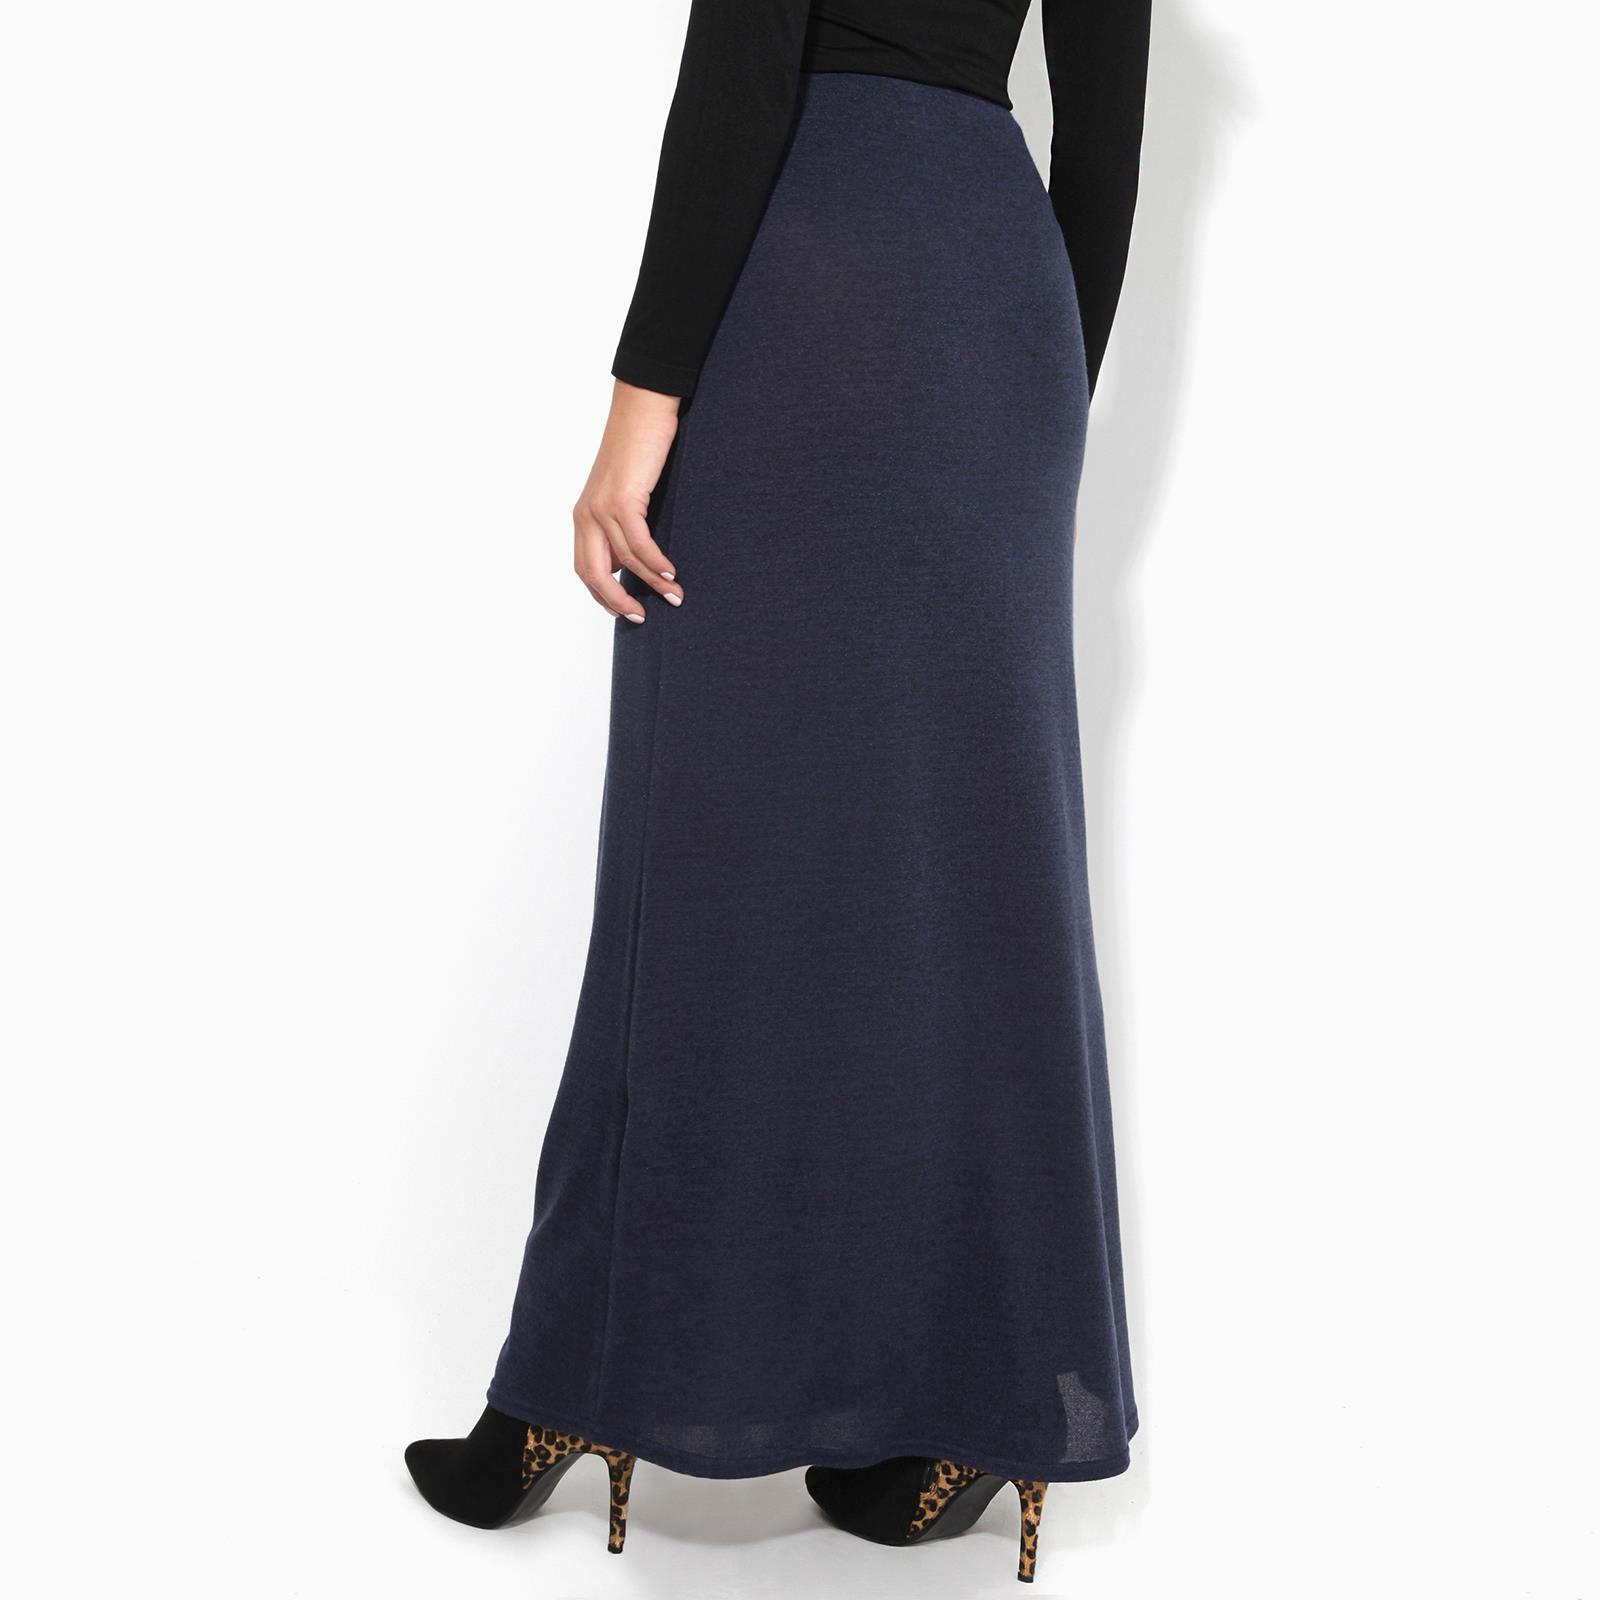 Womens-Ladies-Maxi-Skirt-High-Waist-A-Line-Long-Knit-Stretch-Bodycon-Casual-Boho thumbnail 15